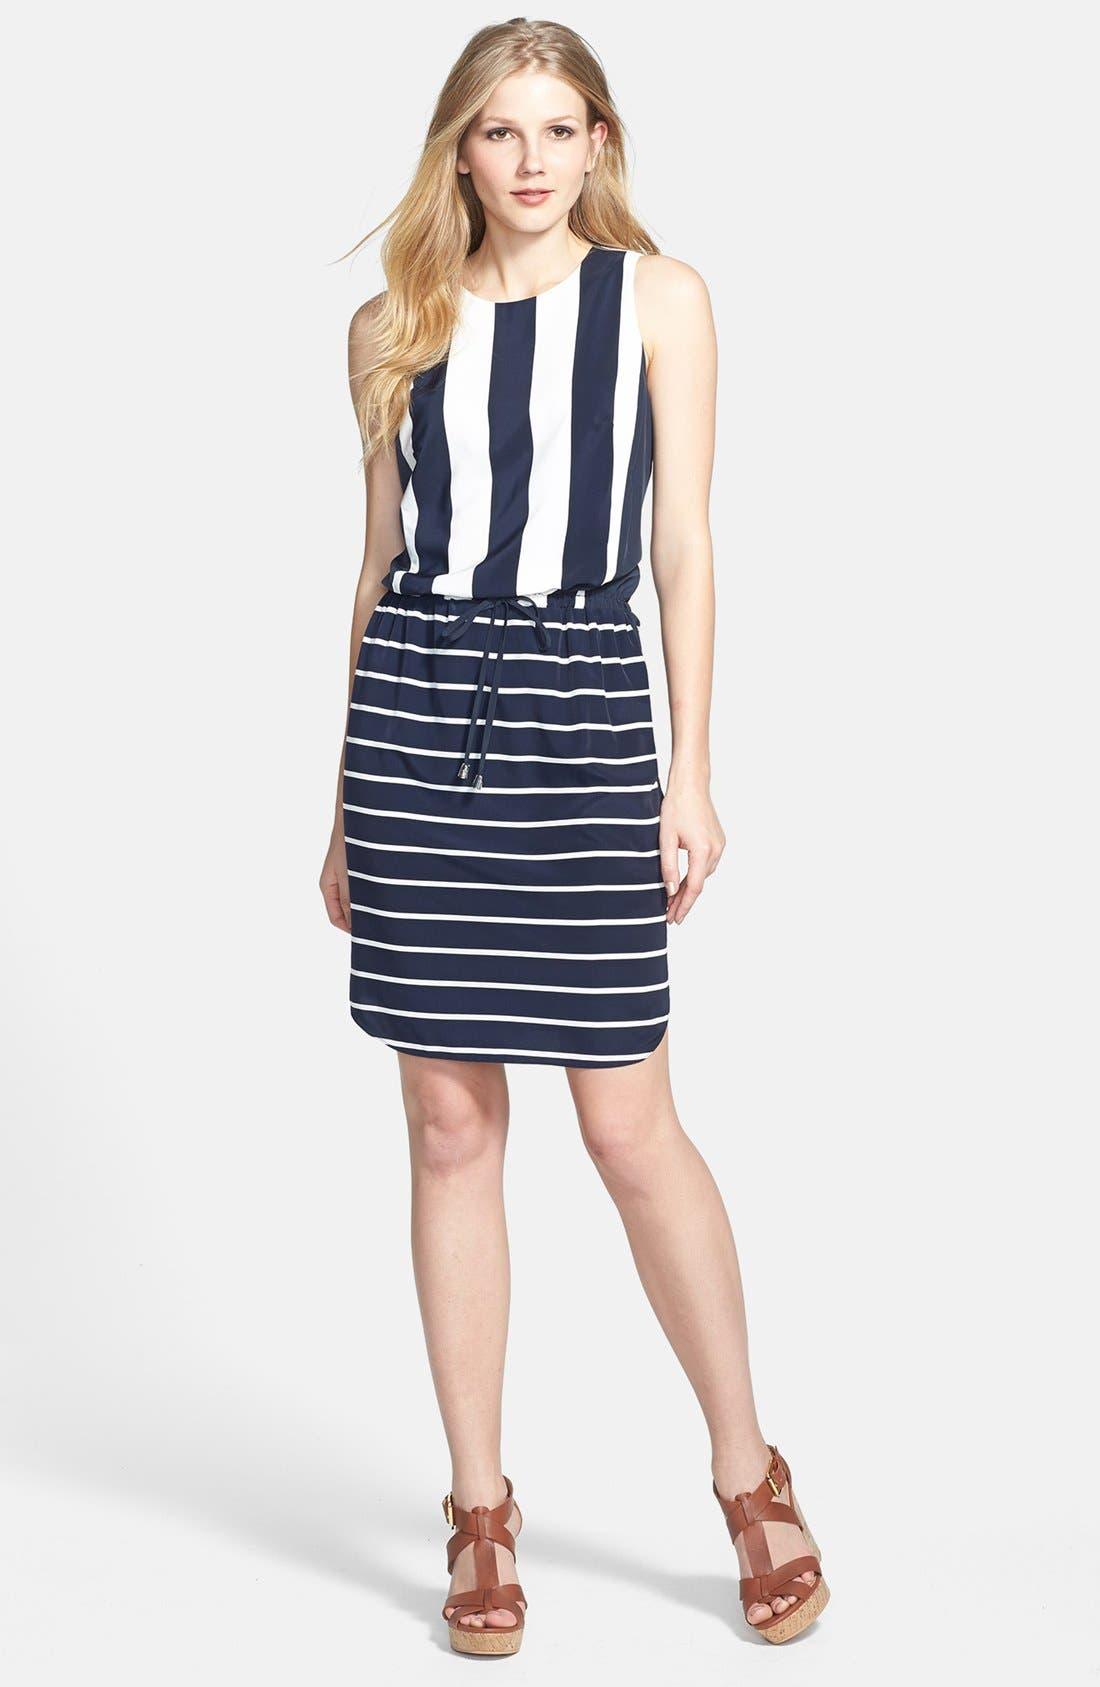 Alternate Image 1 Selected - Vince Camuto 'Yacht Stripe' Mixed Print Dress (Regular & Petite)